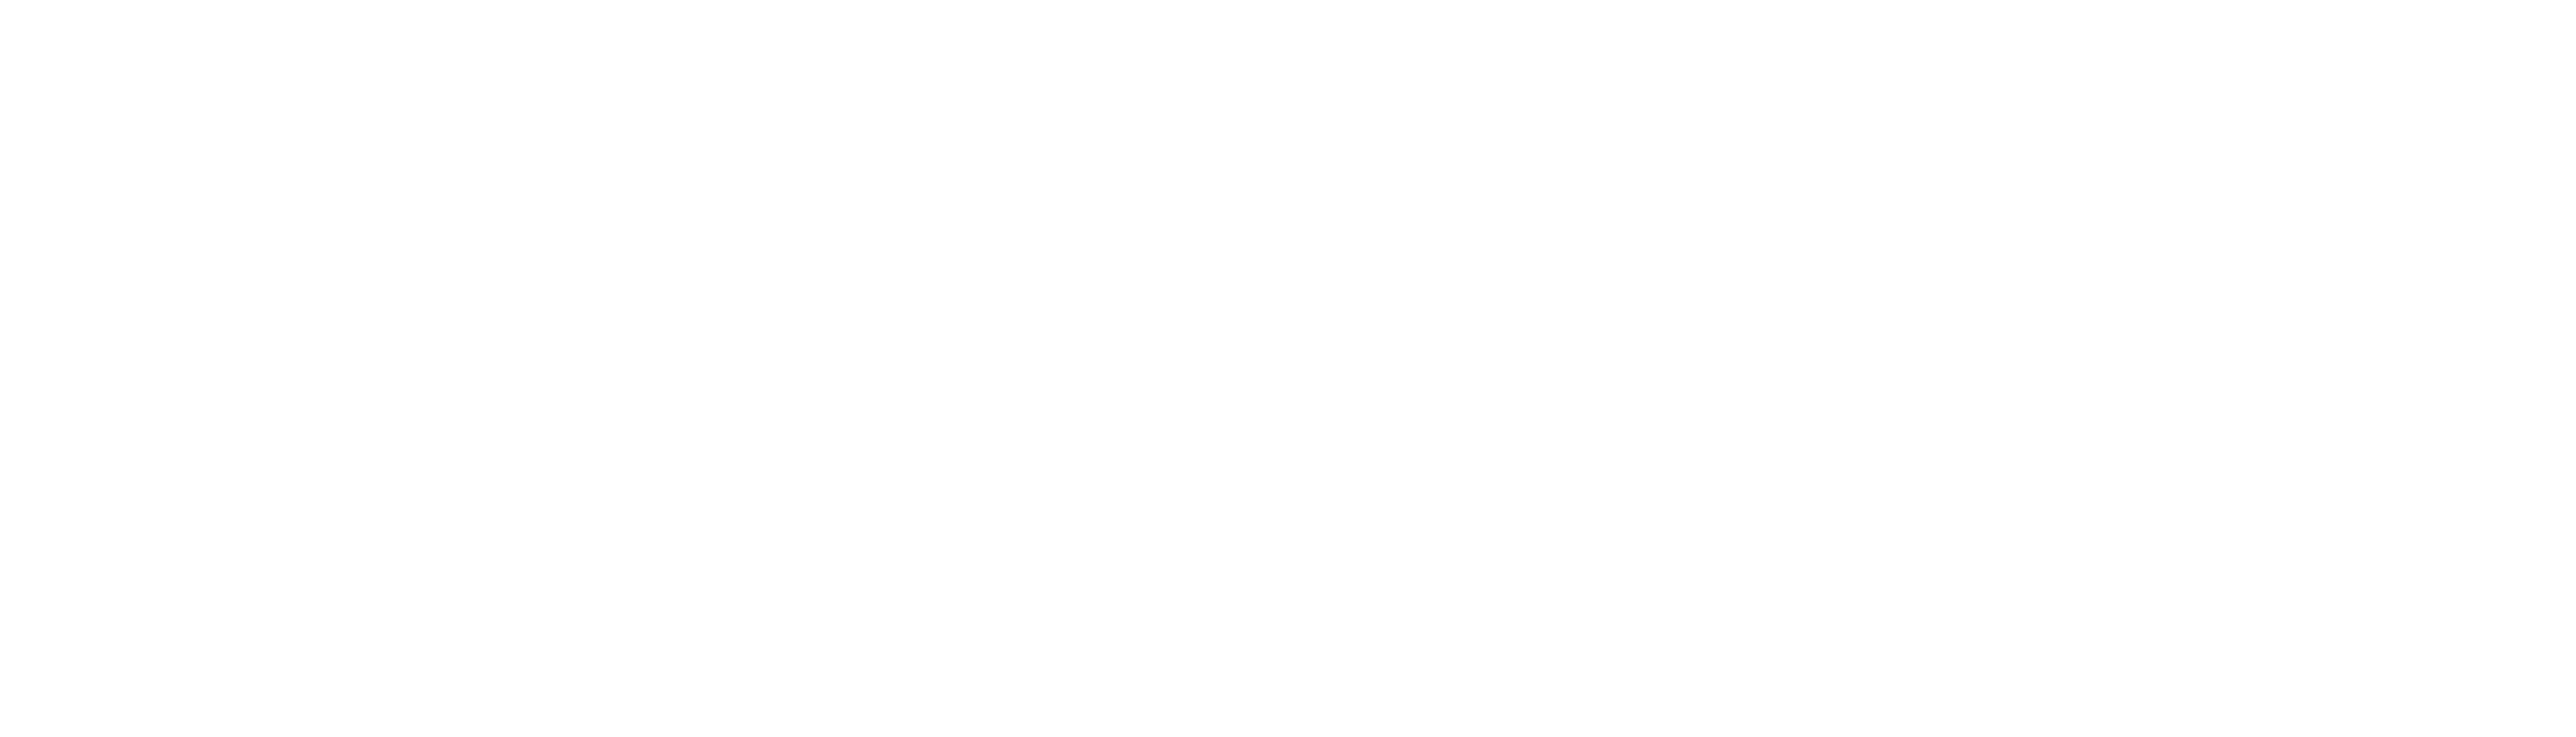 Flexsource Managed Services